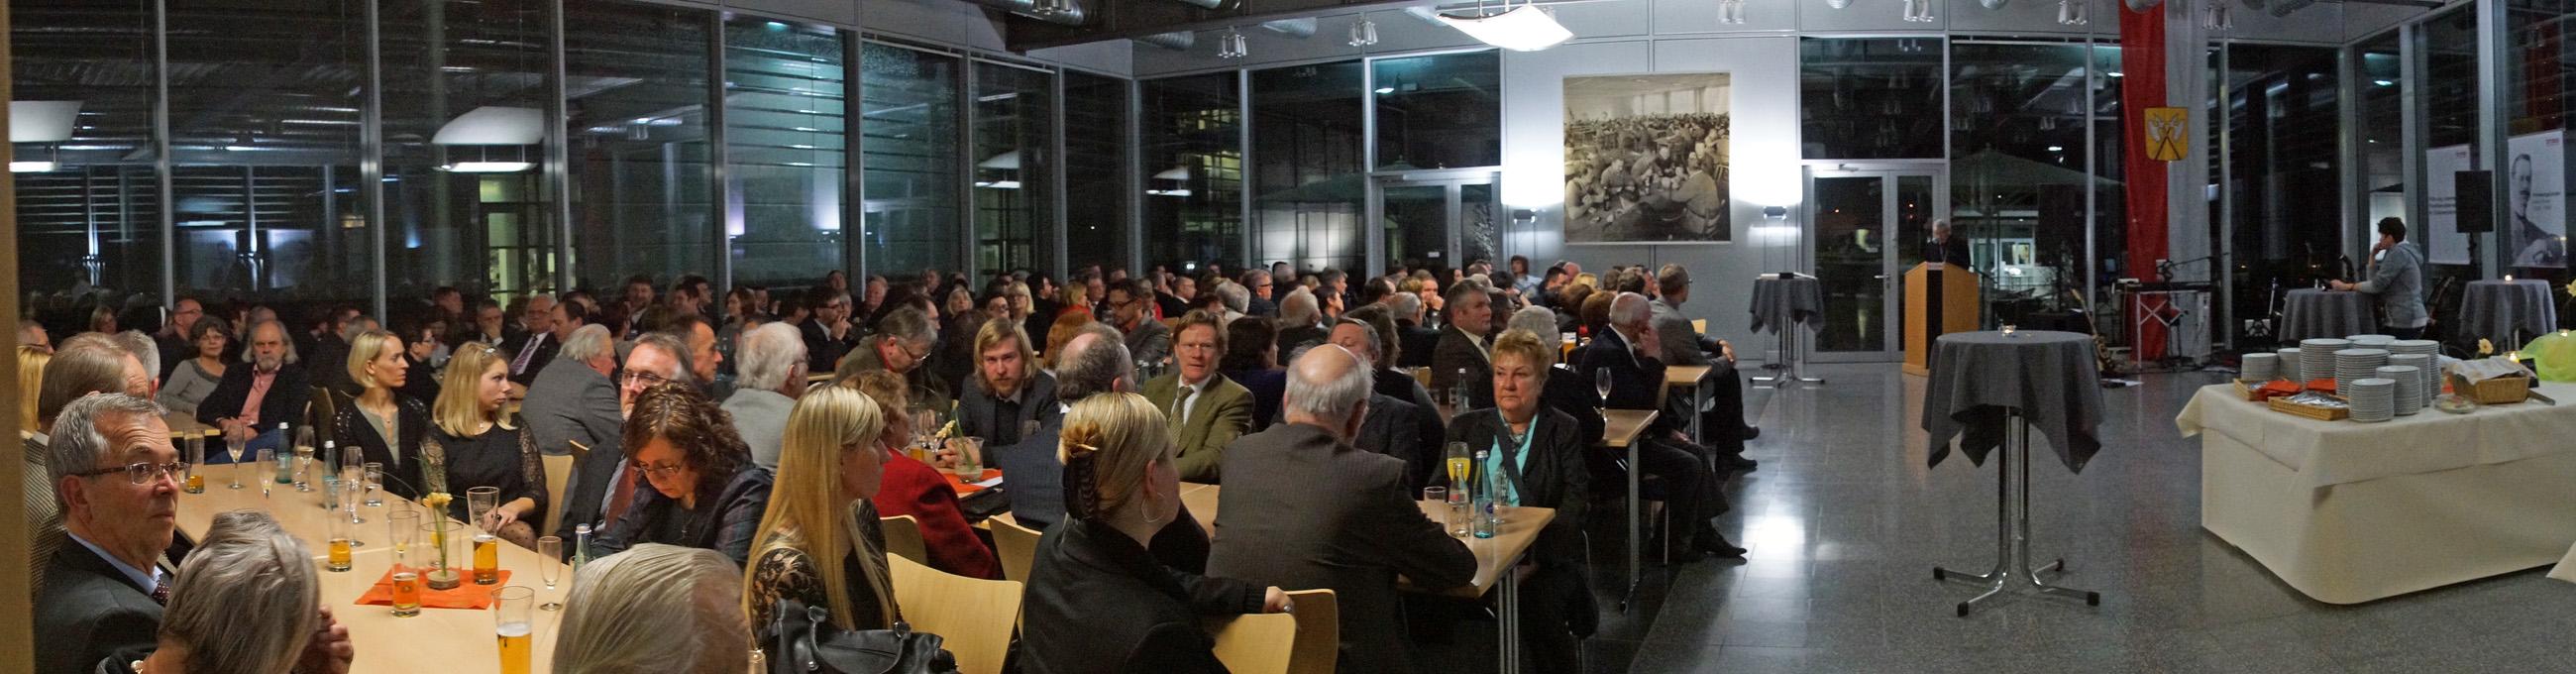 Neujahrsempfang Hallstadt 2014